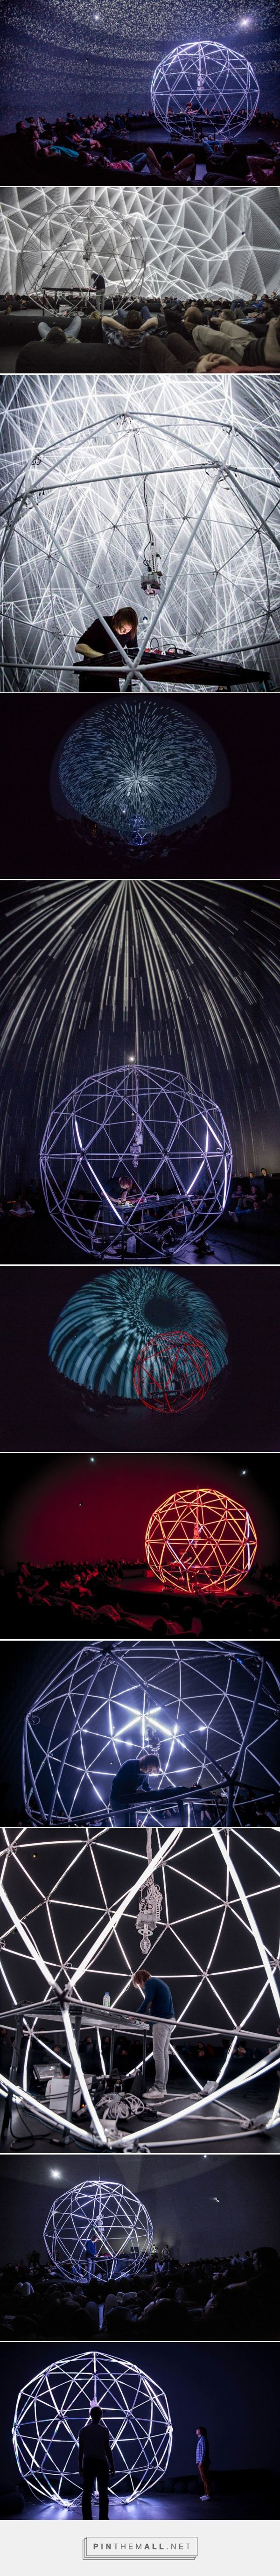 sound artist fraction presents entropia audio-visual installation - created via http://pinthemall.net